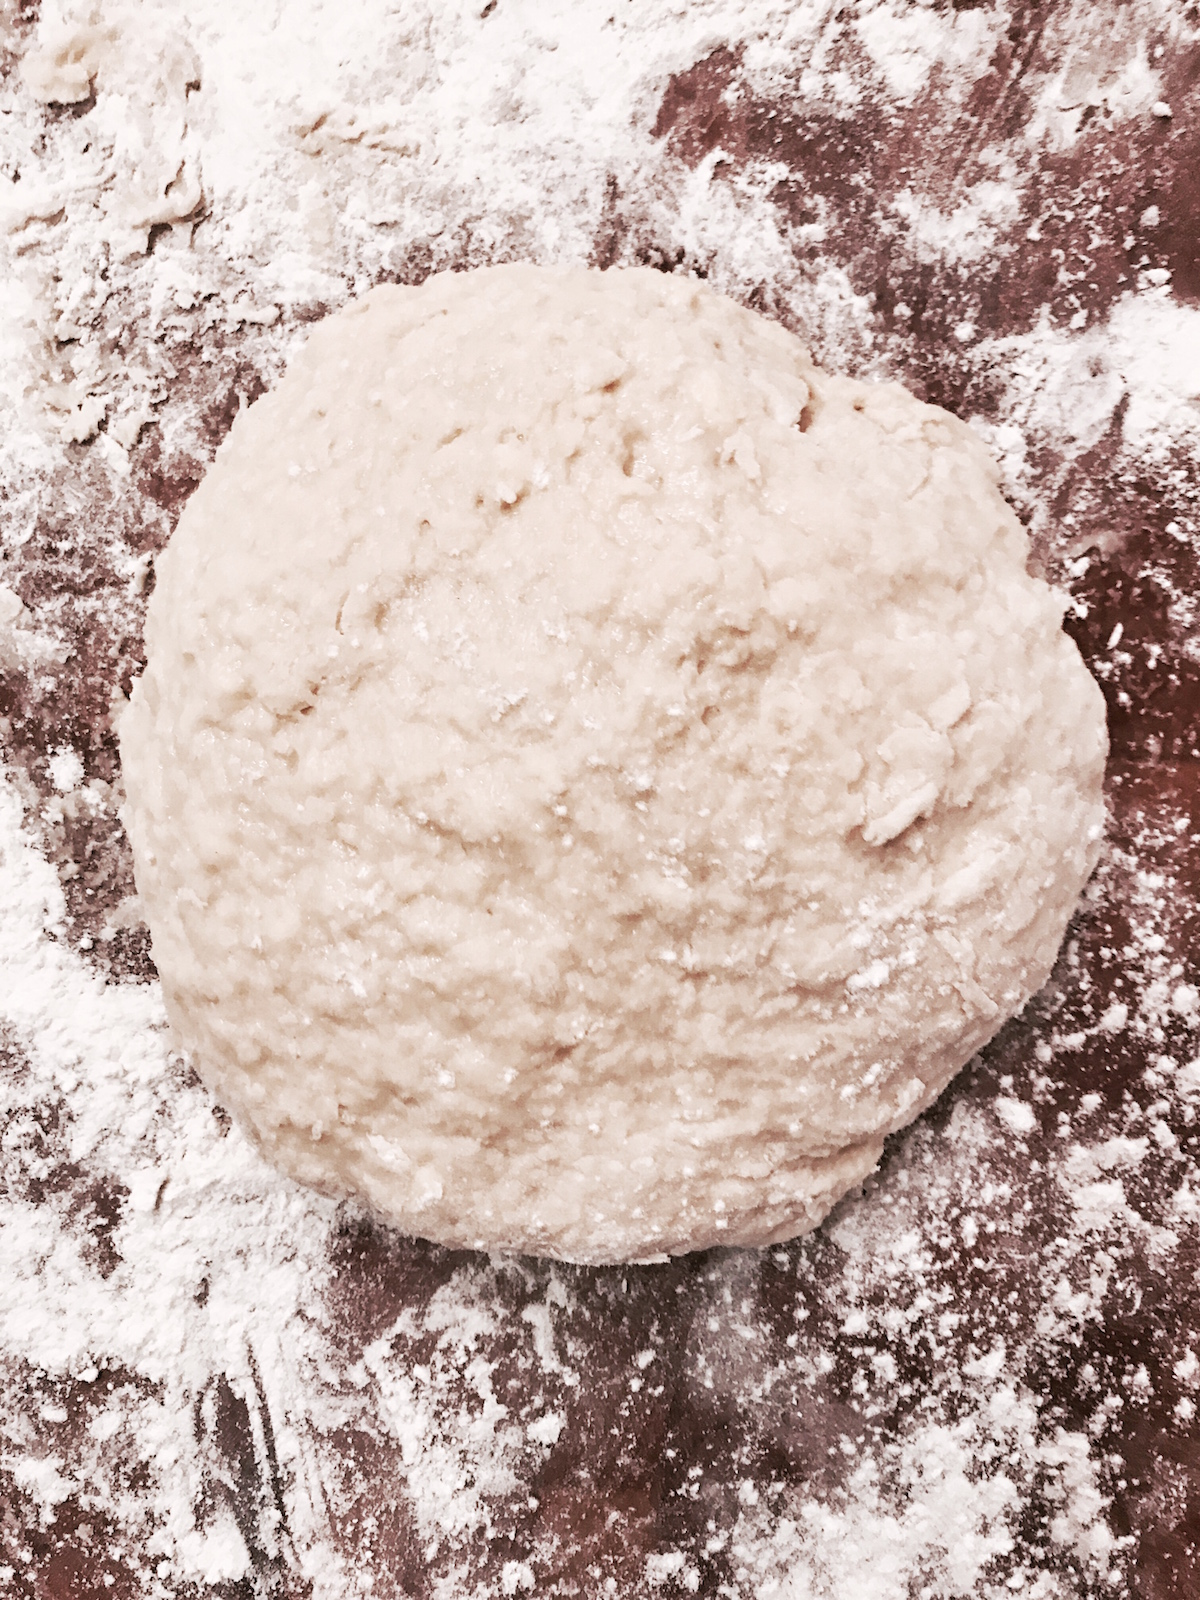 A ball of dough to make scones.